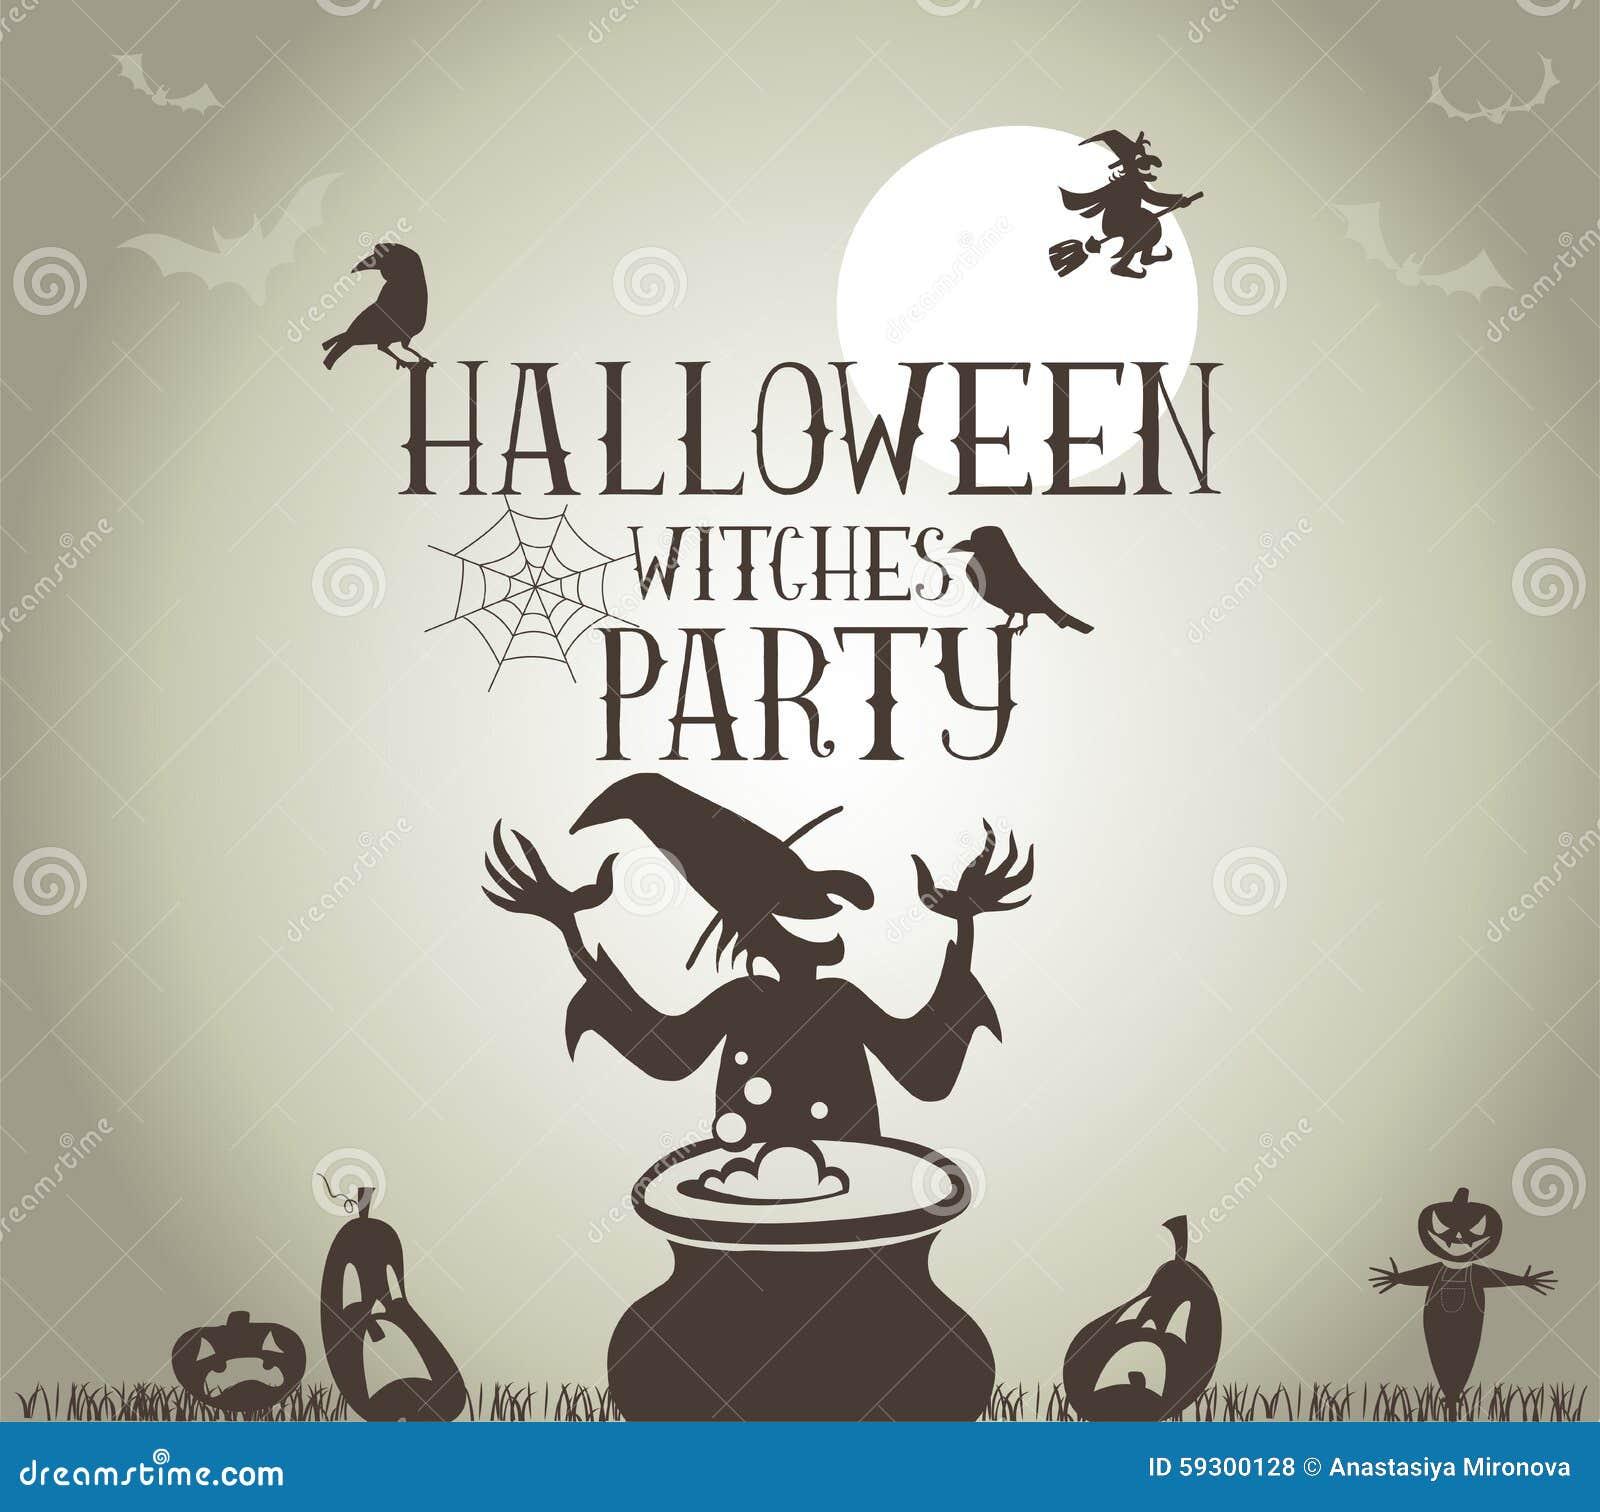 Hexen-Partei